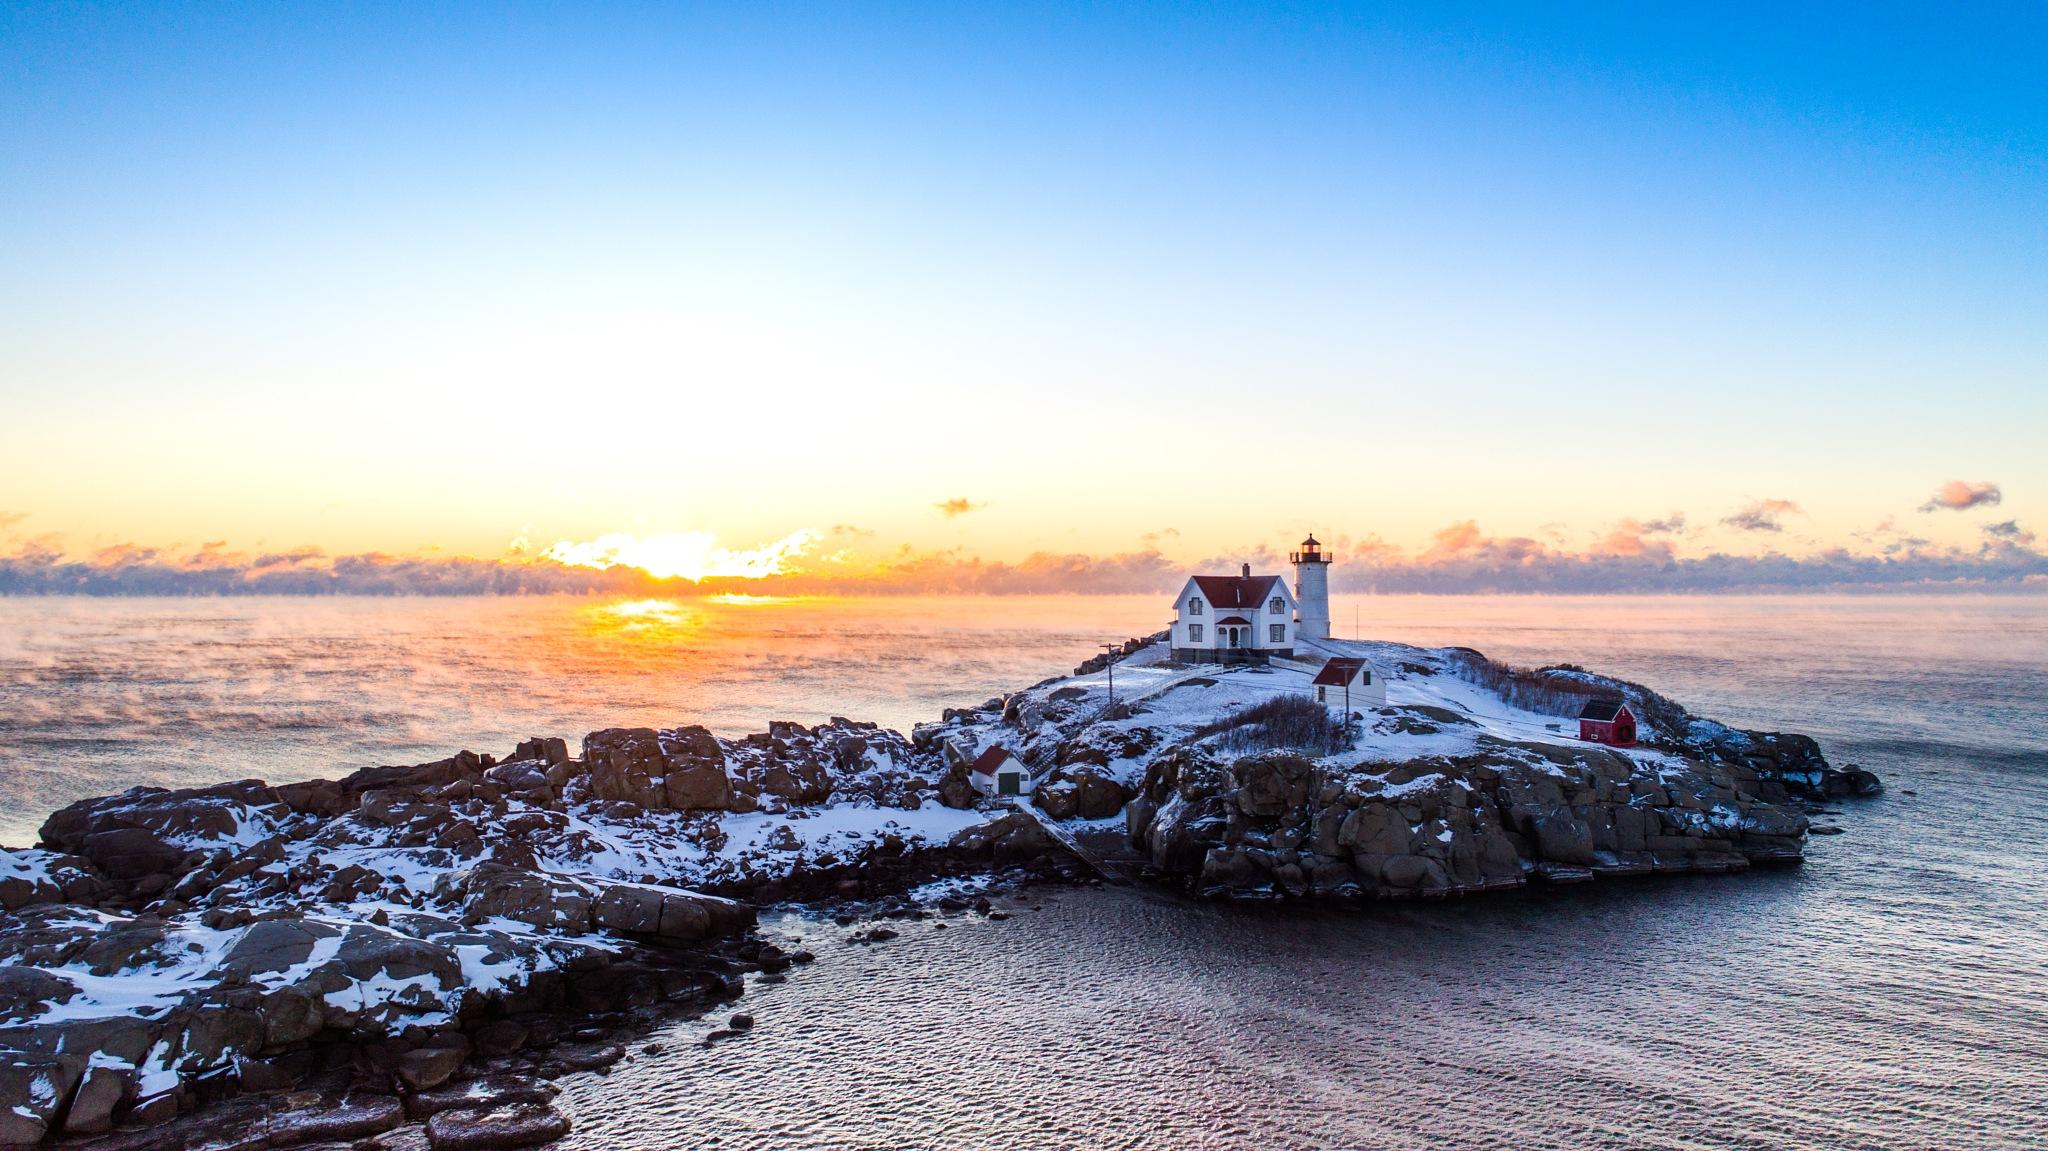 Sunrise at Nubble Lighthouse by HawkVisuals